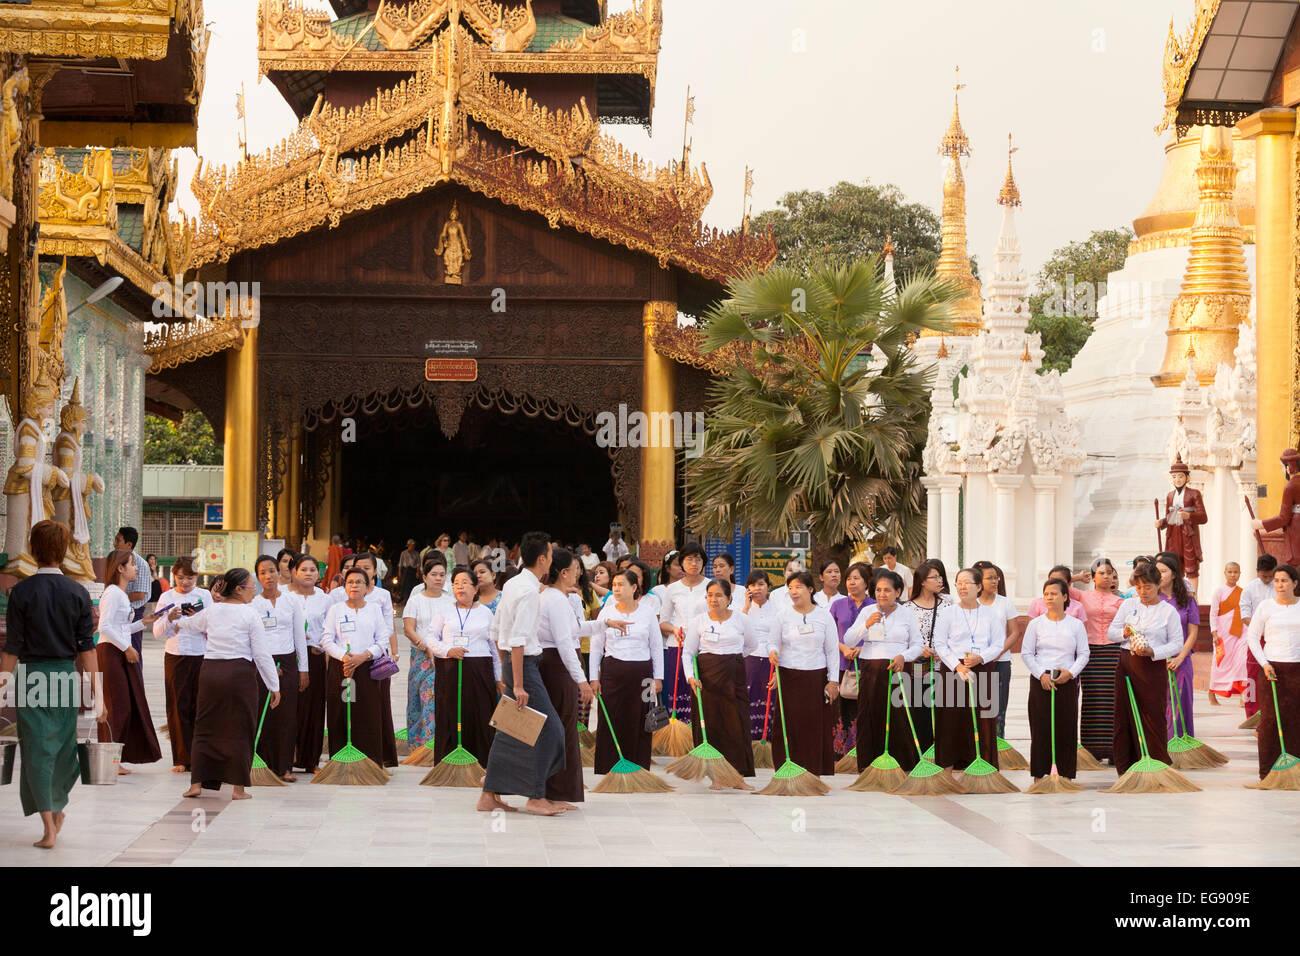 Young women sweeping the ground at sunset, the Shwedagon Pagoda, Yangon, Myanmar ( Burma ), Asia - Stock Image